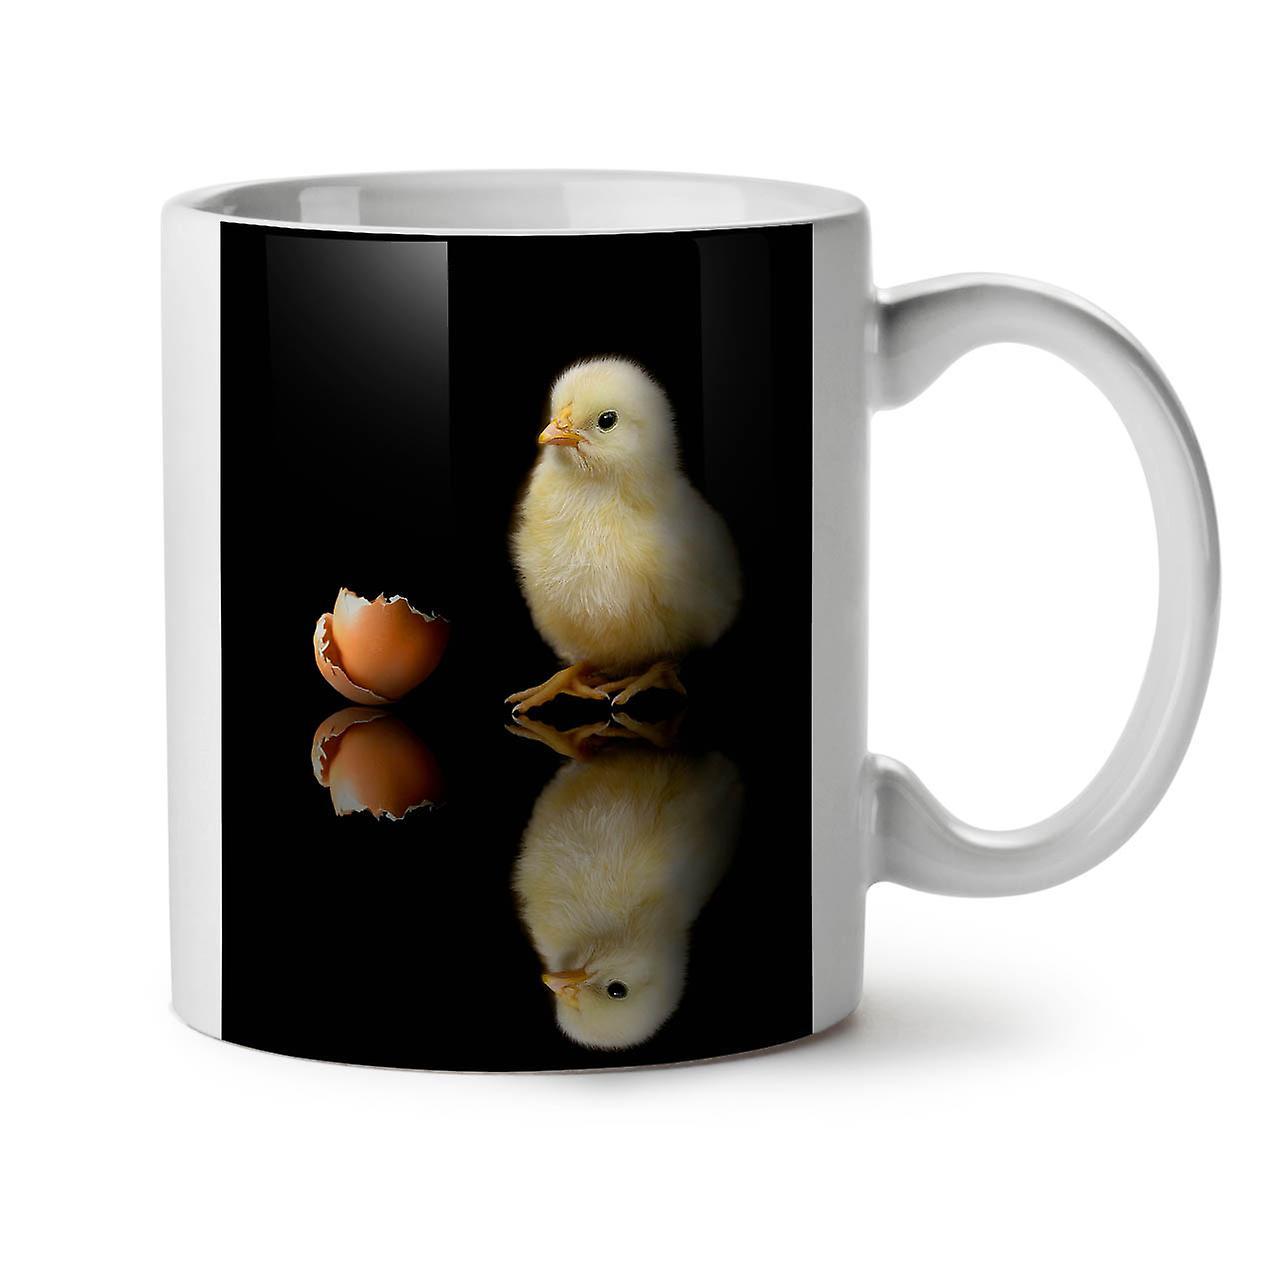 Chick Nature Photo NEW White Tea Coffee Ceramic Mug 11 oz   Wellcoda